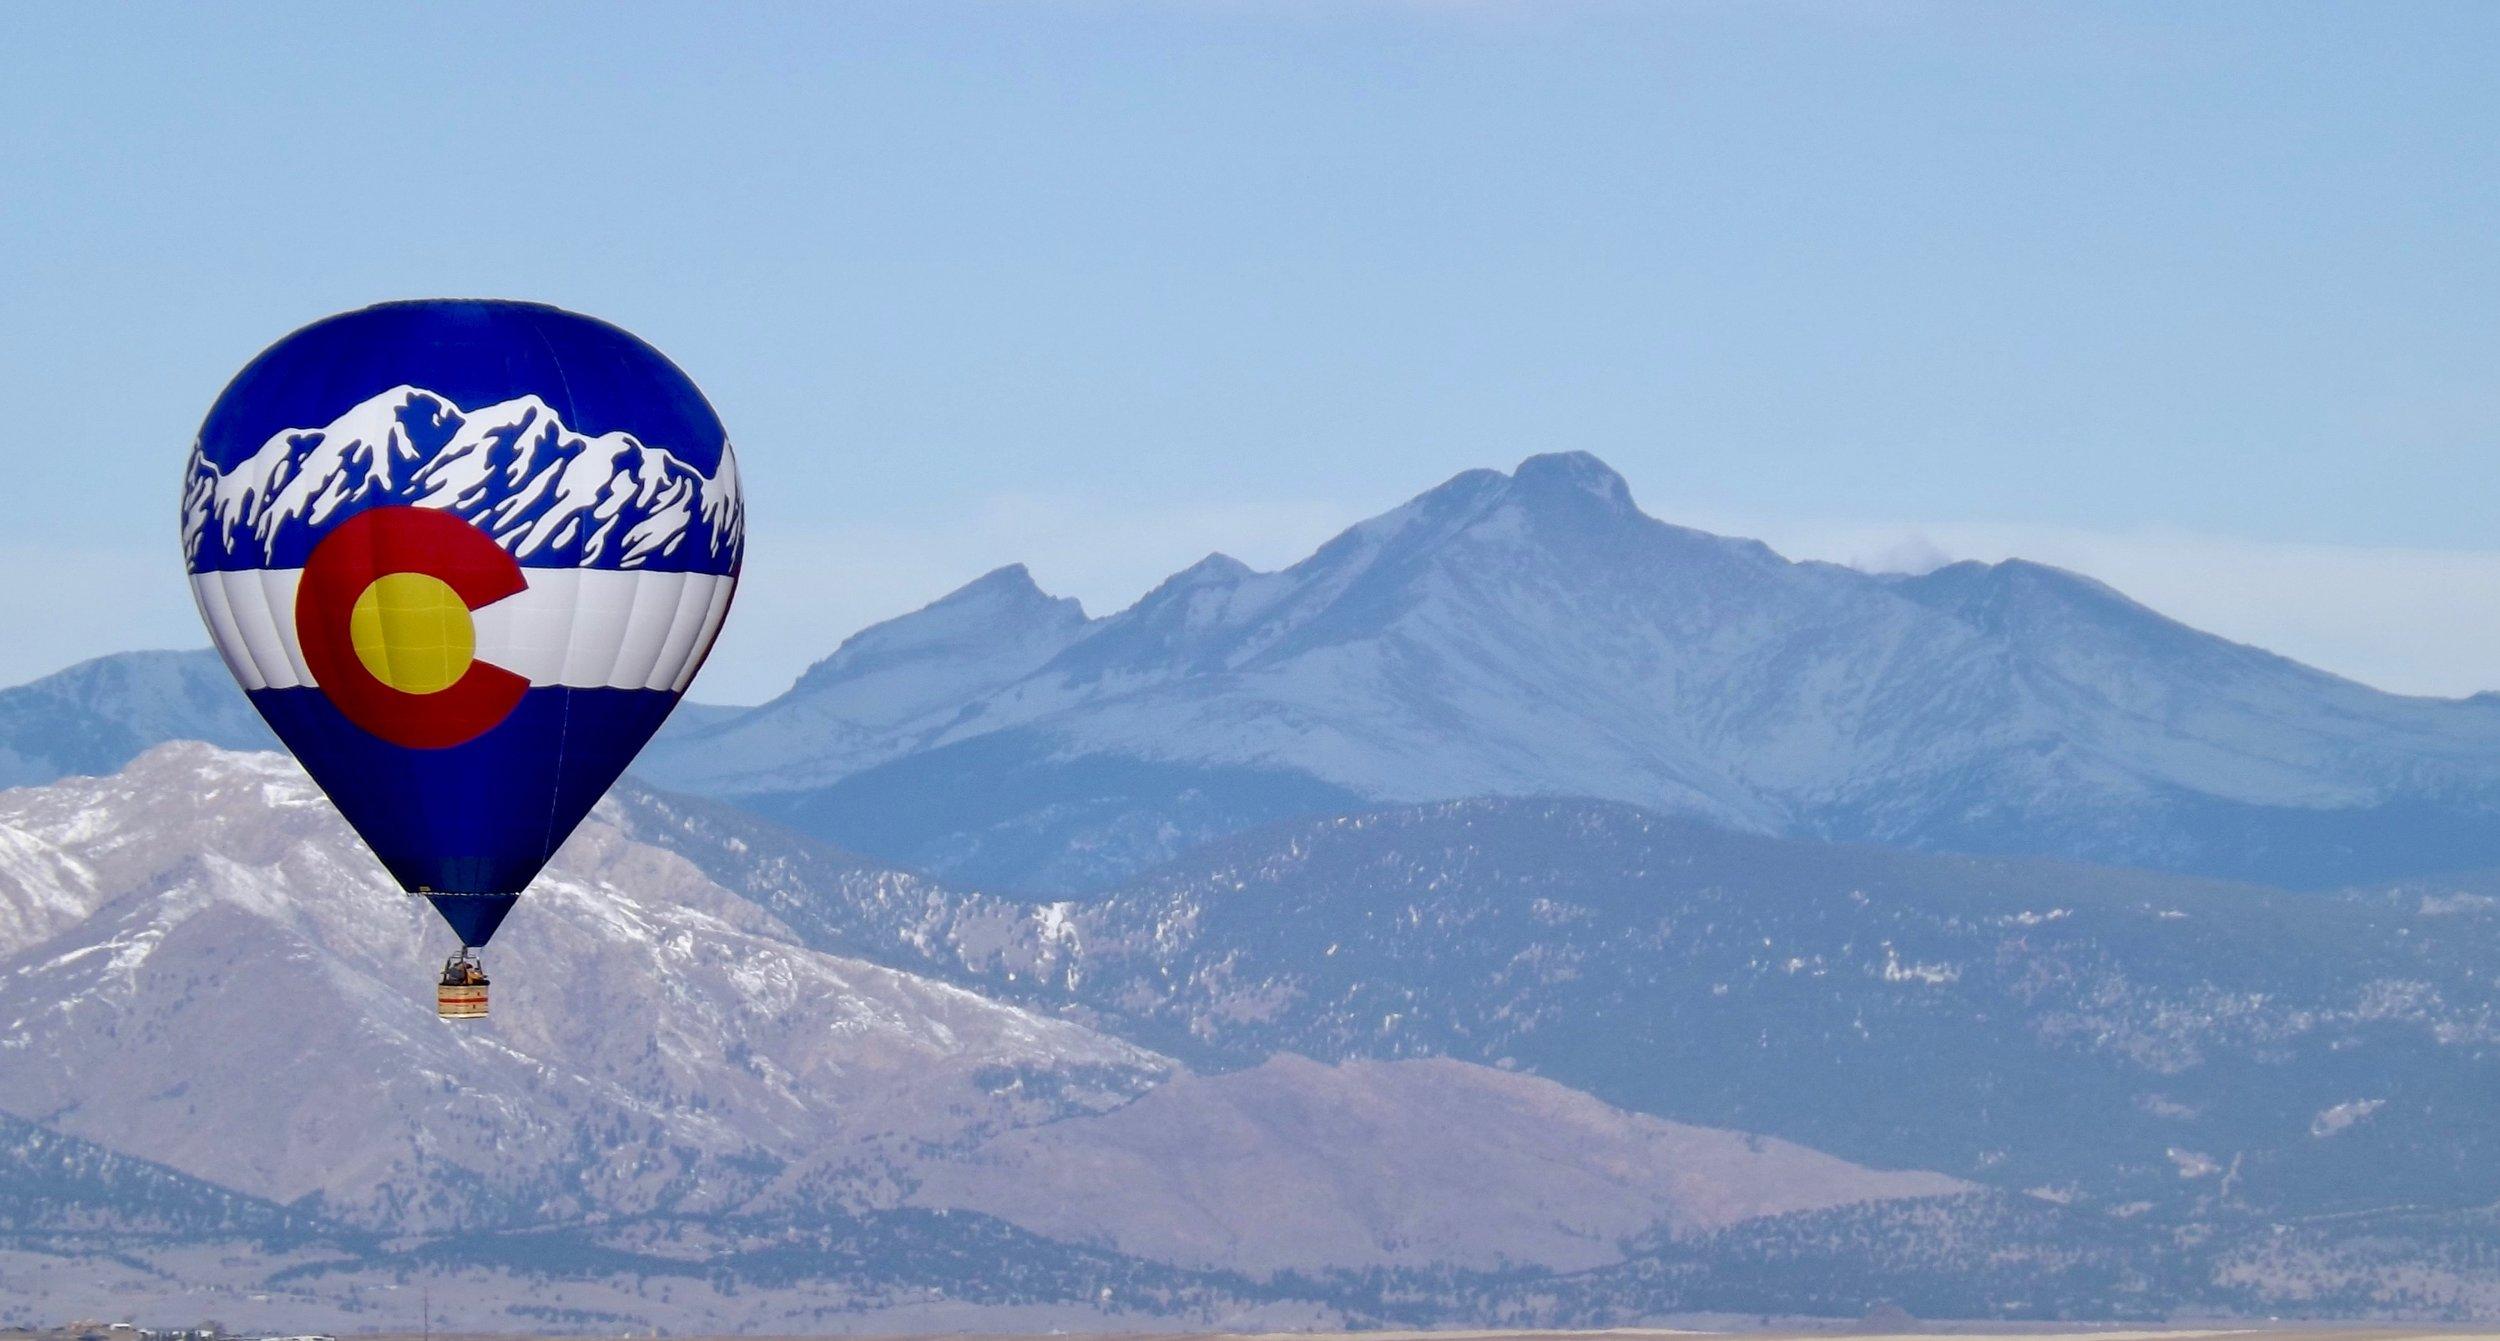 Coloradoballoonlongspeak.jpg